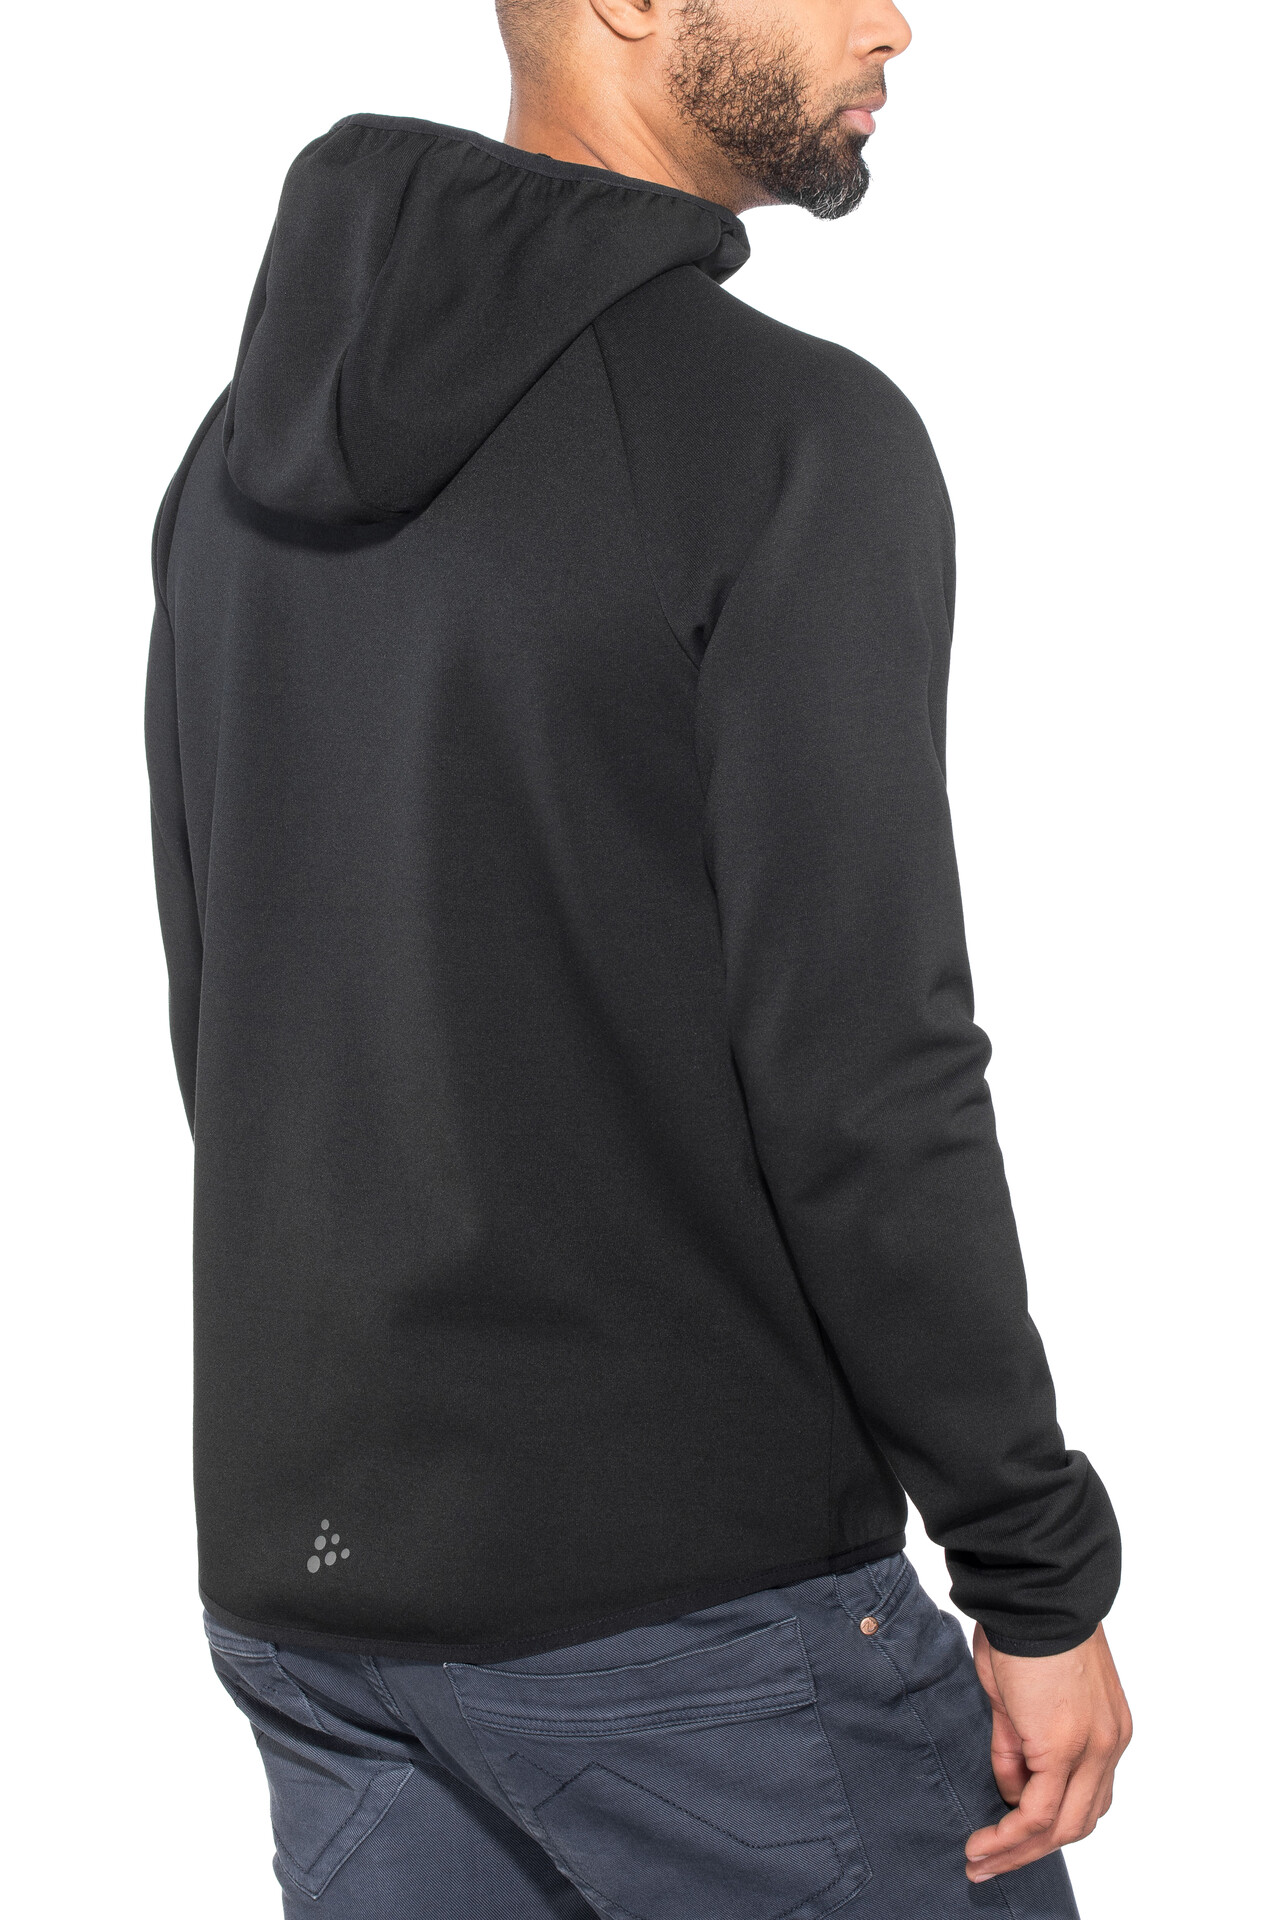 Outdoor Bekleidung Sonstige Outdoor-Bekleidung Craft Emotion Hood Sweatshirt Men dark navy 2019 Midlayer blau